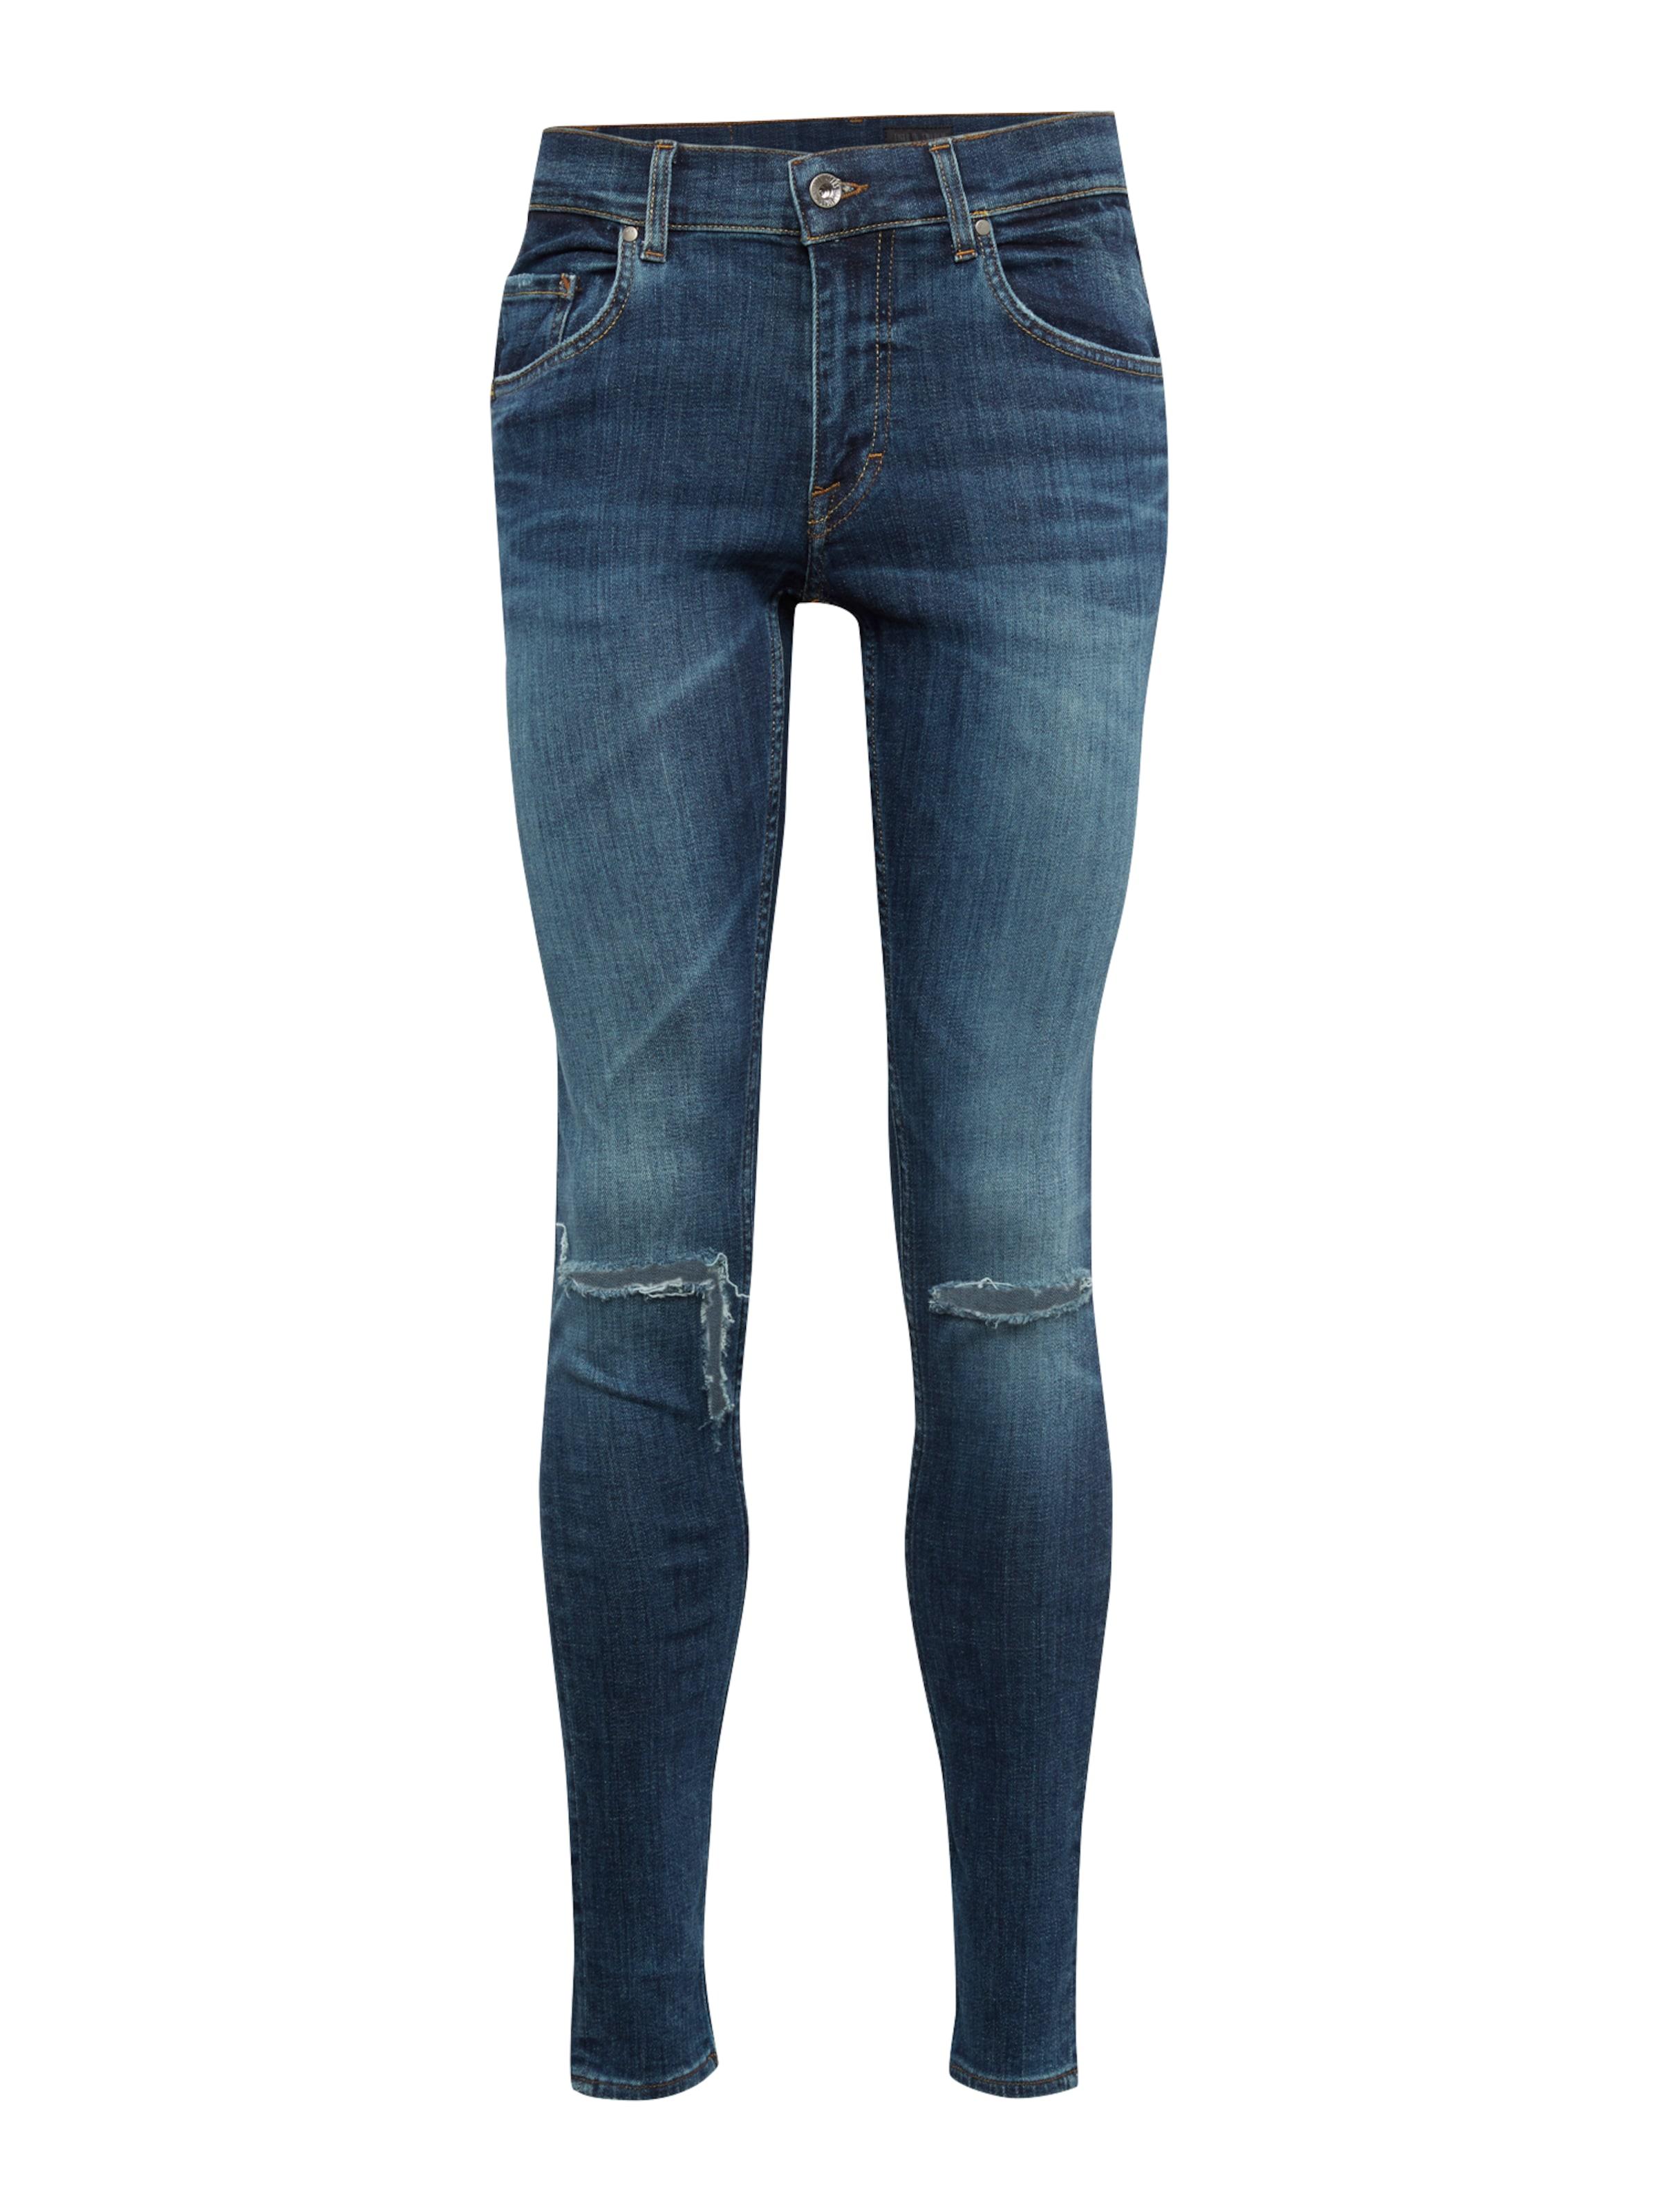 Tiger Of Denim Blue Sweden Jeans In tQxrhdsC